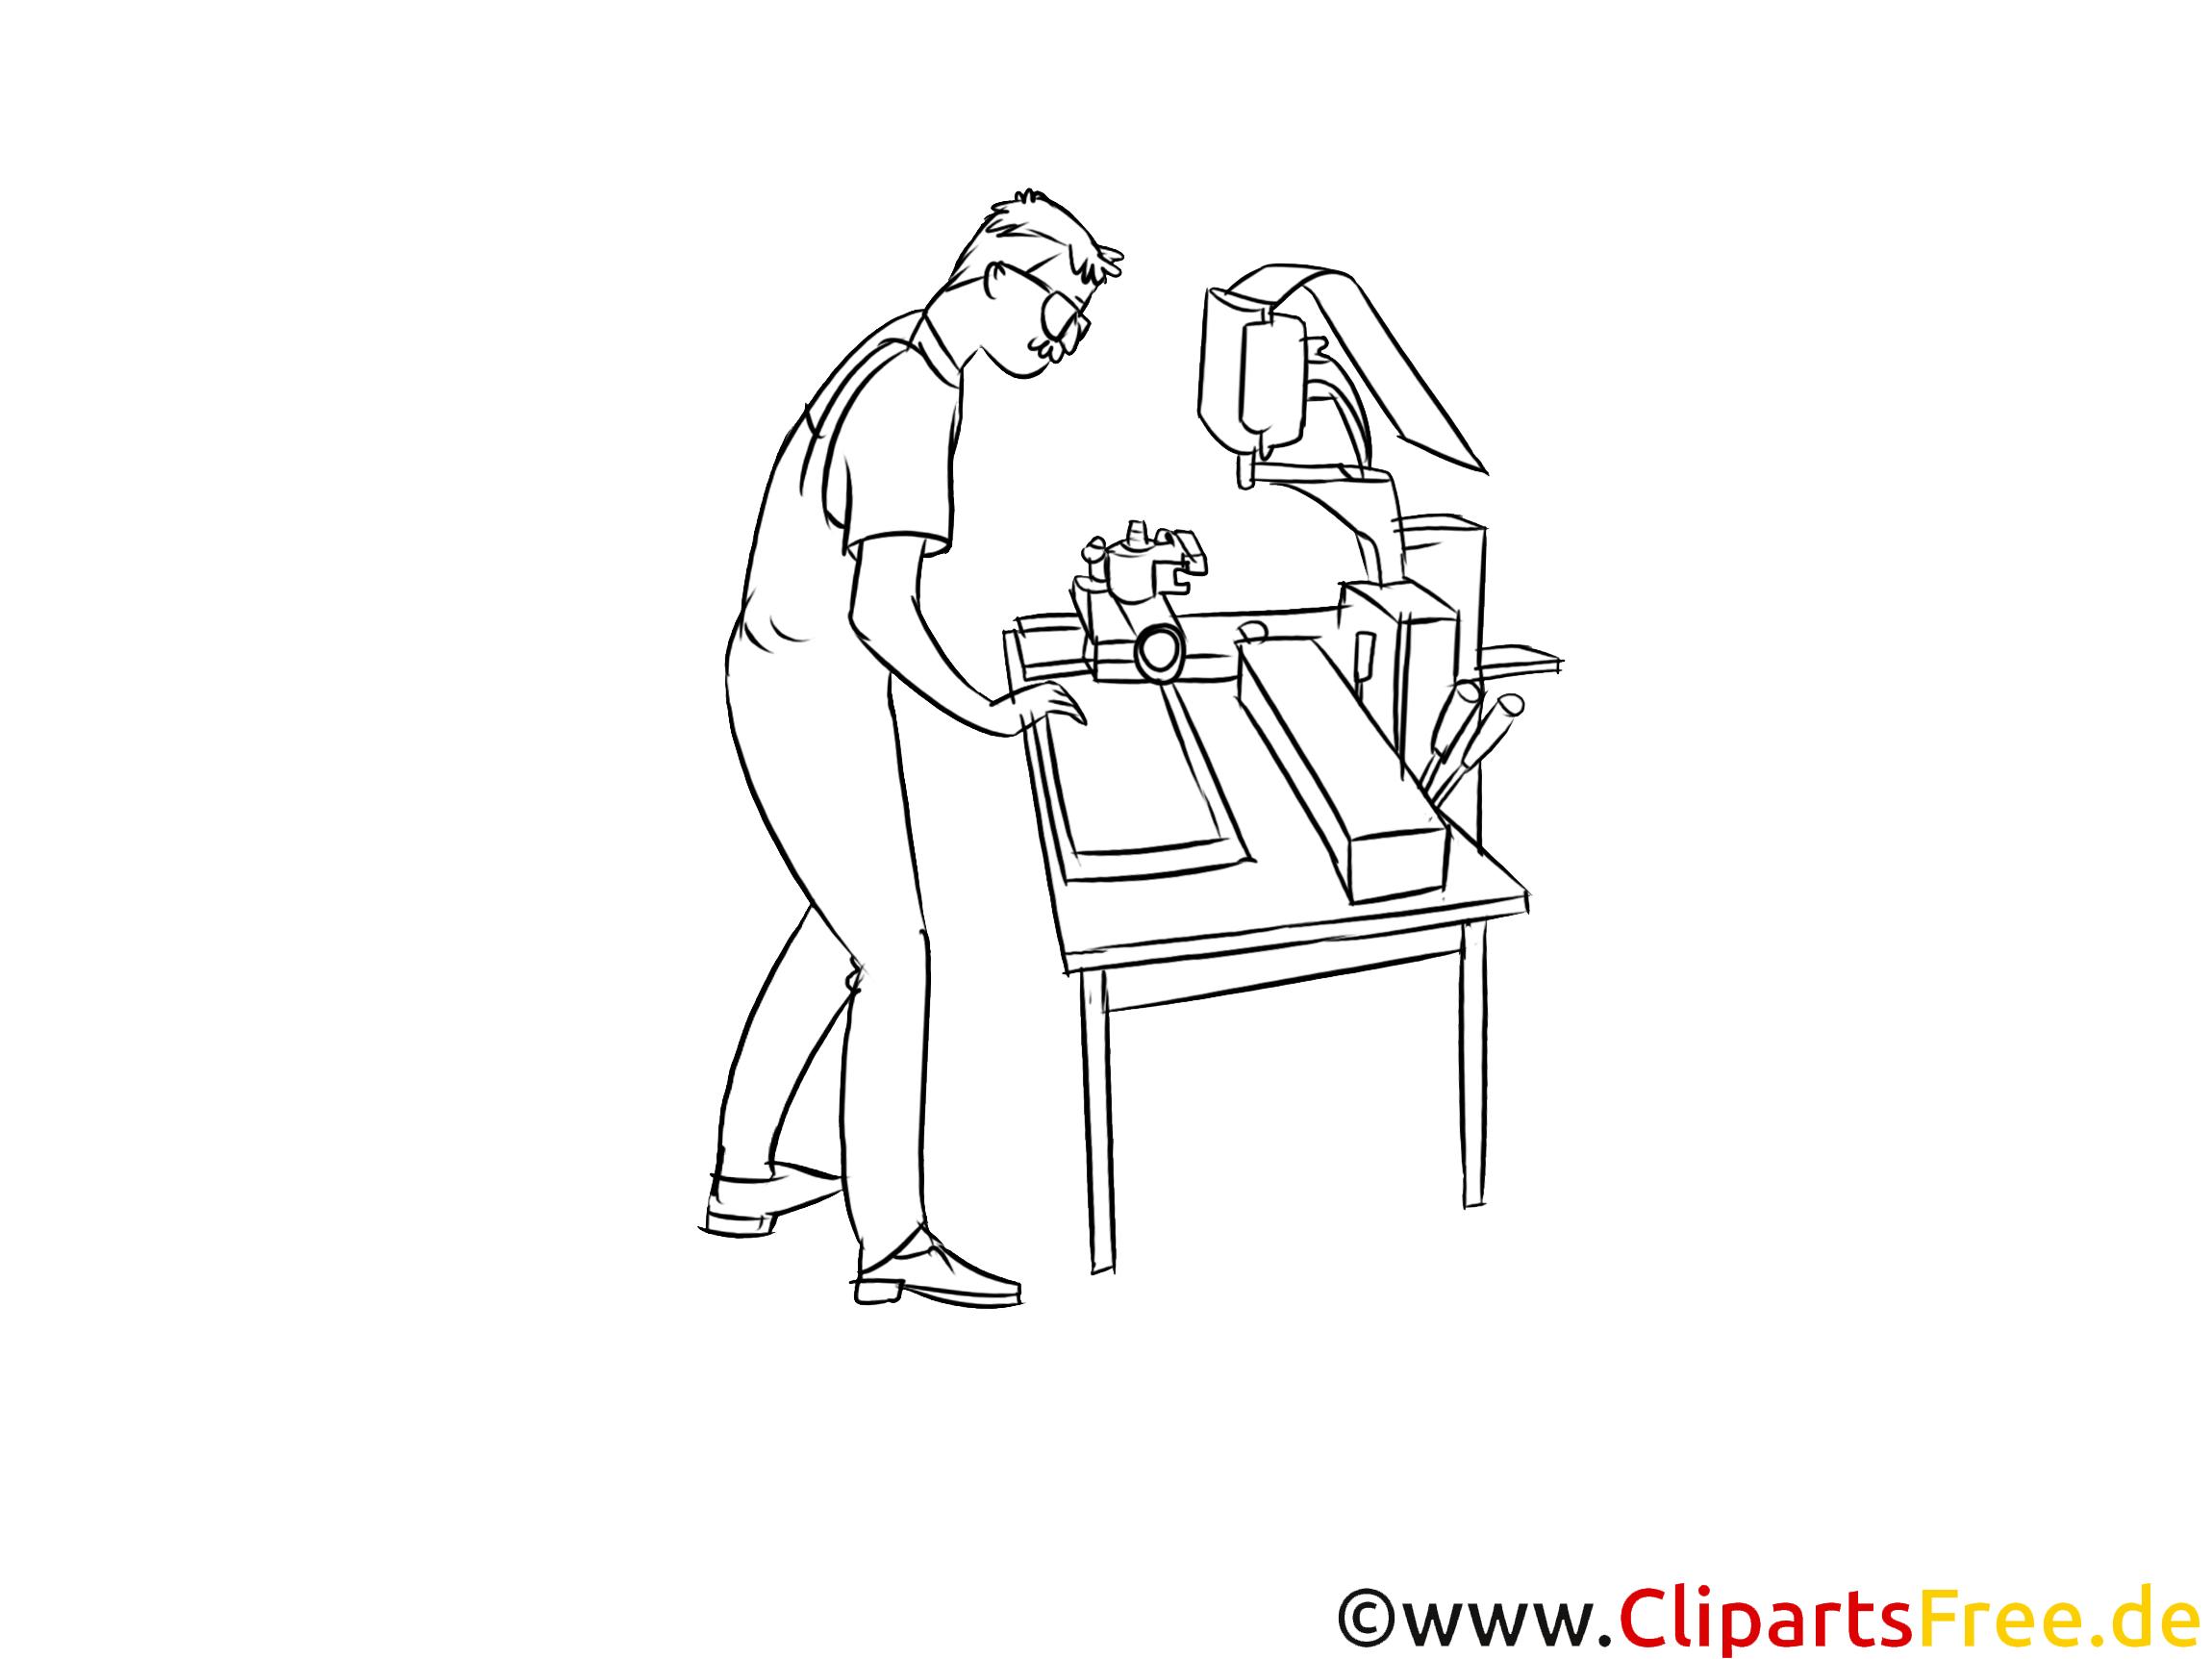 Produktionsmechaniker schwarz weiß Clipart